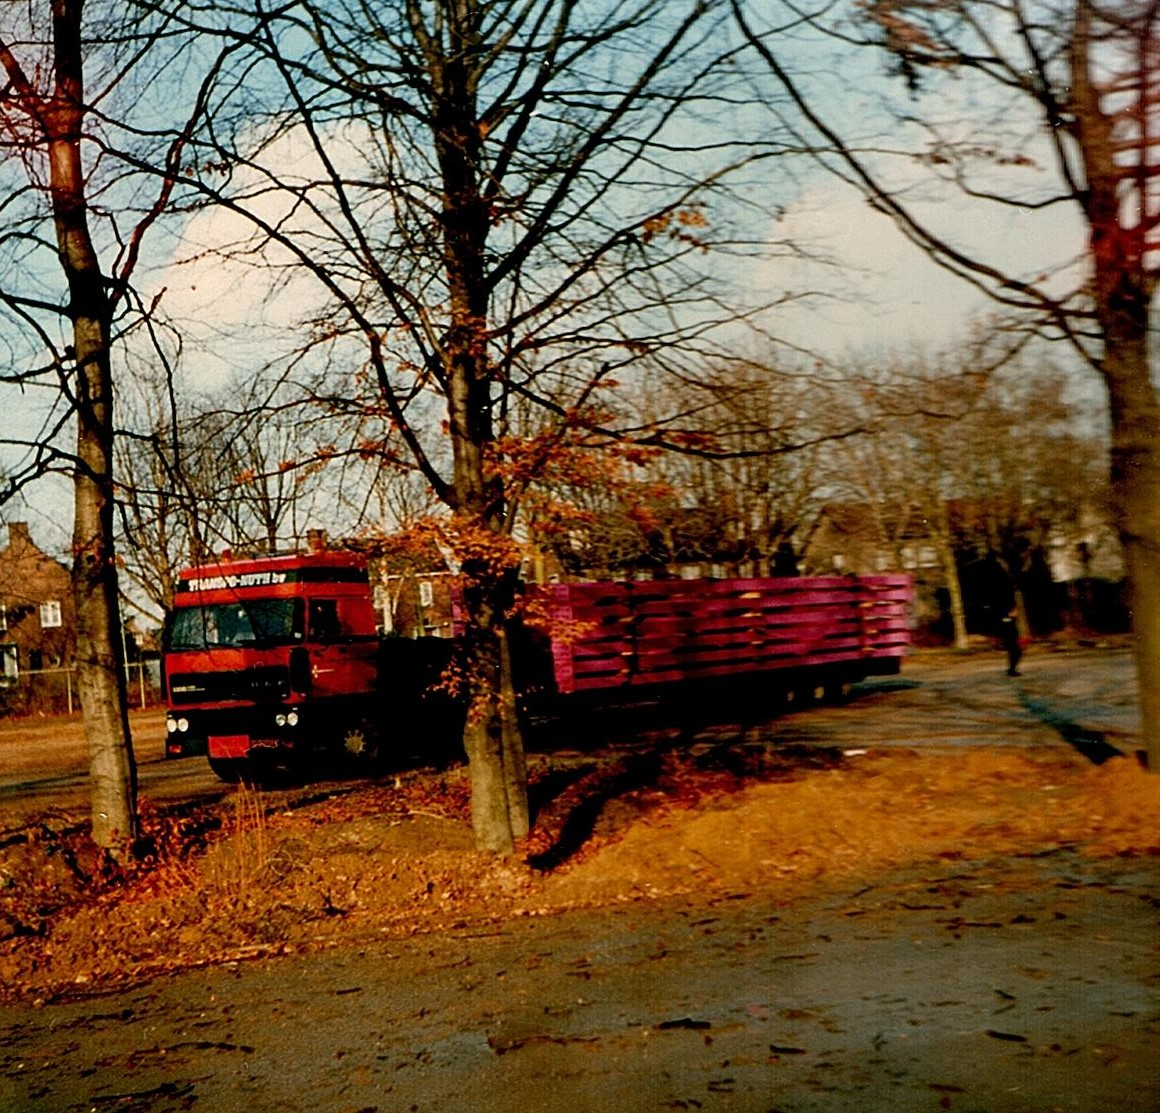 daf-breedte-transport-bert-cosemans-1